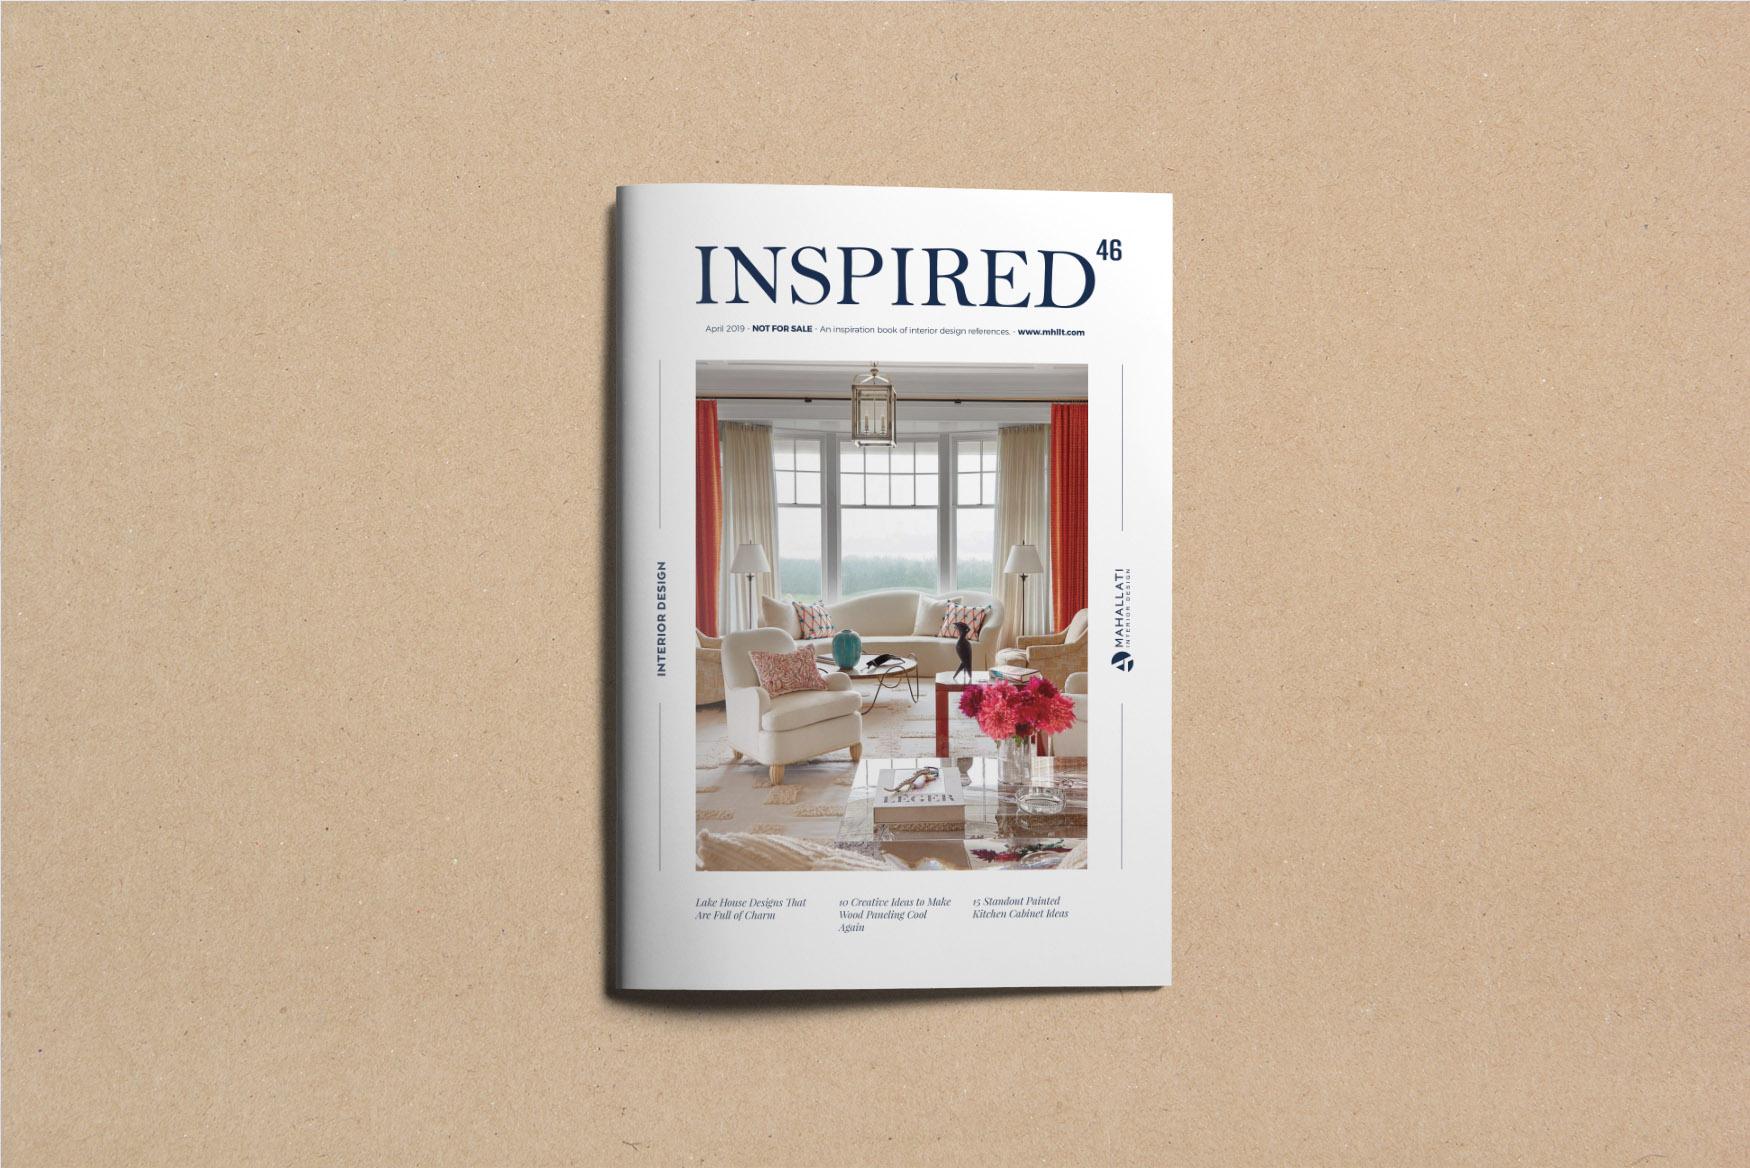 Inspired Vol 46 - April 2019